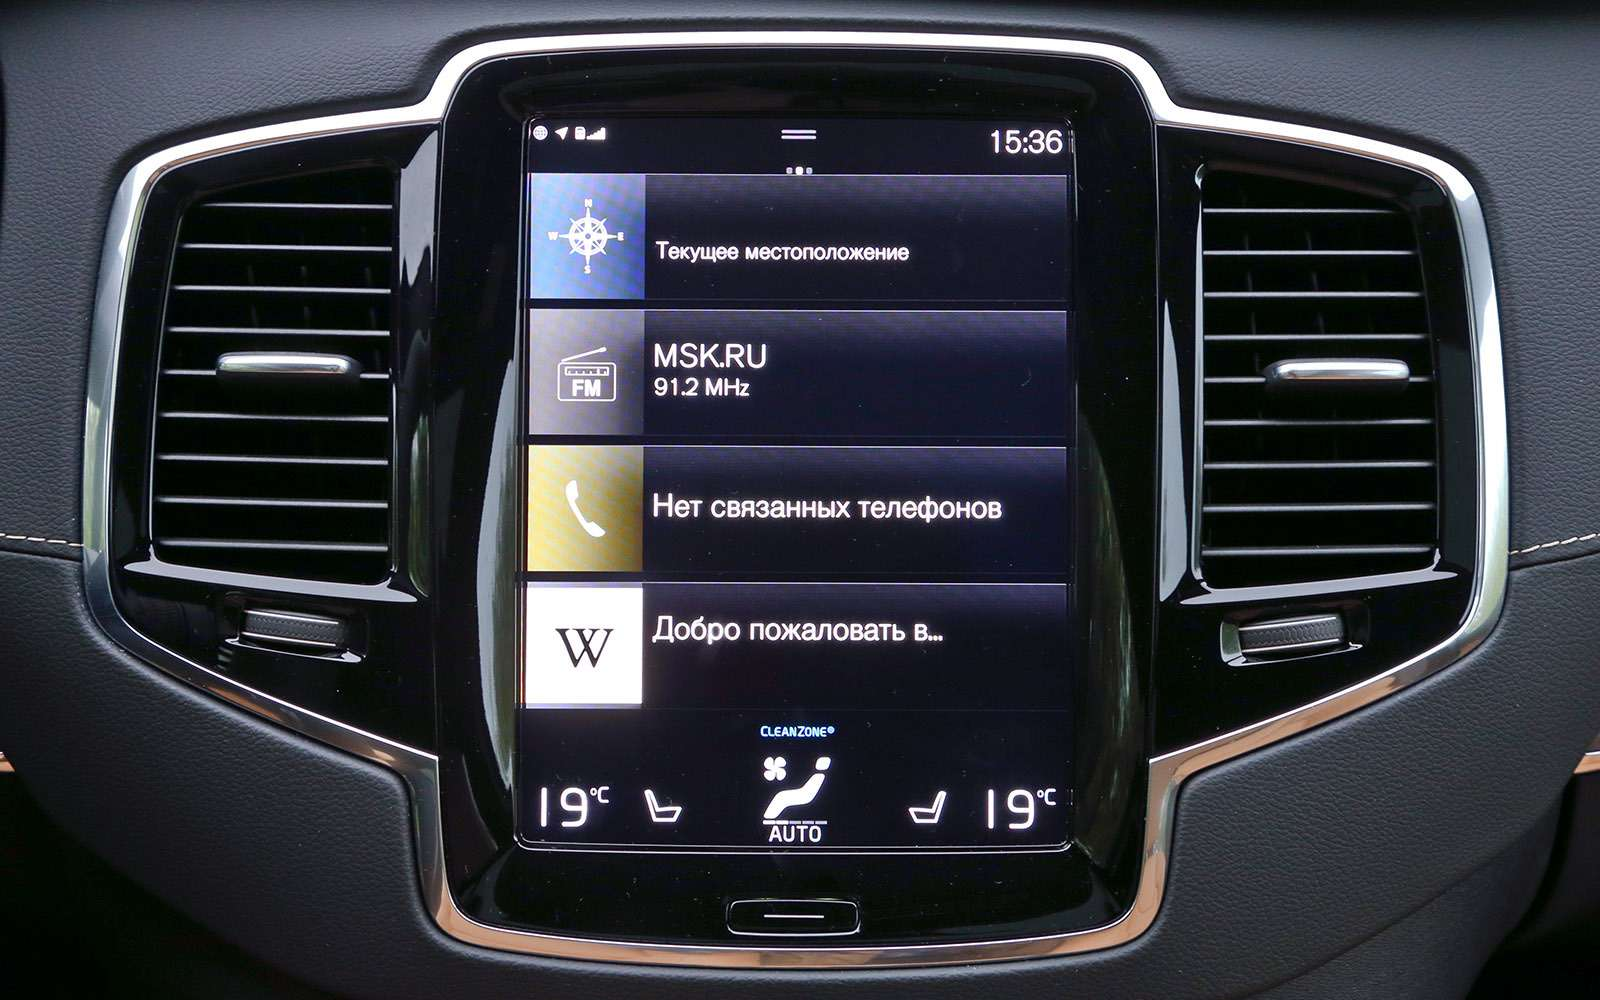 Новый Land Rover Discovery против конкурентов— тест ЗР— фото 784701